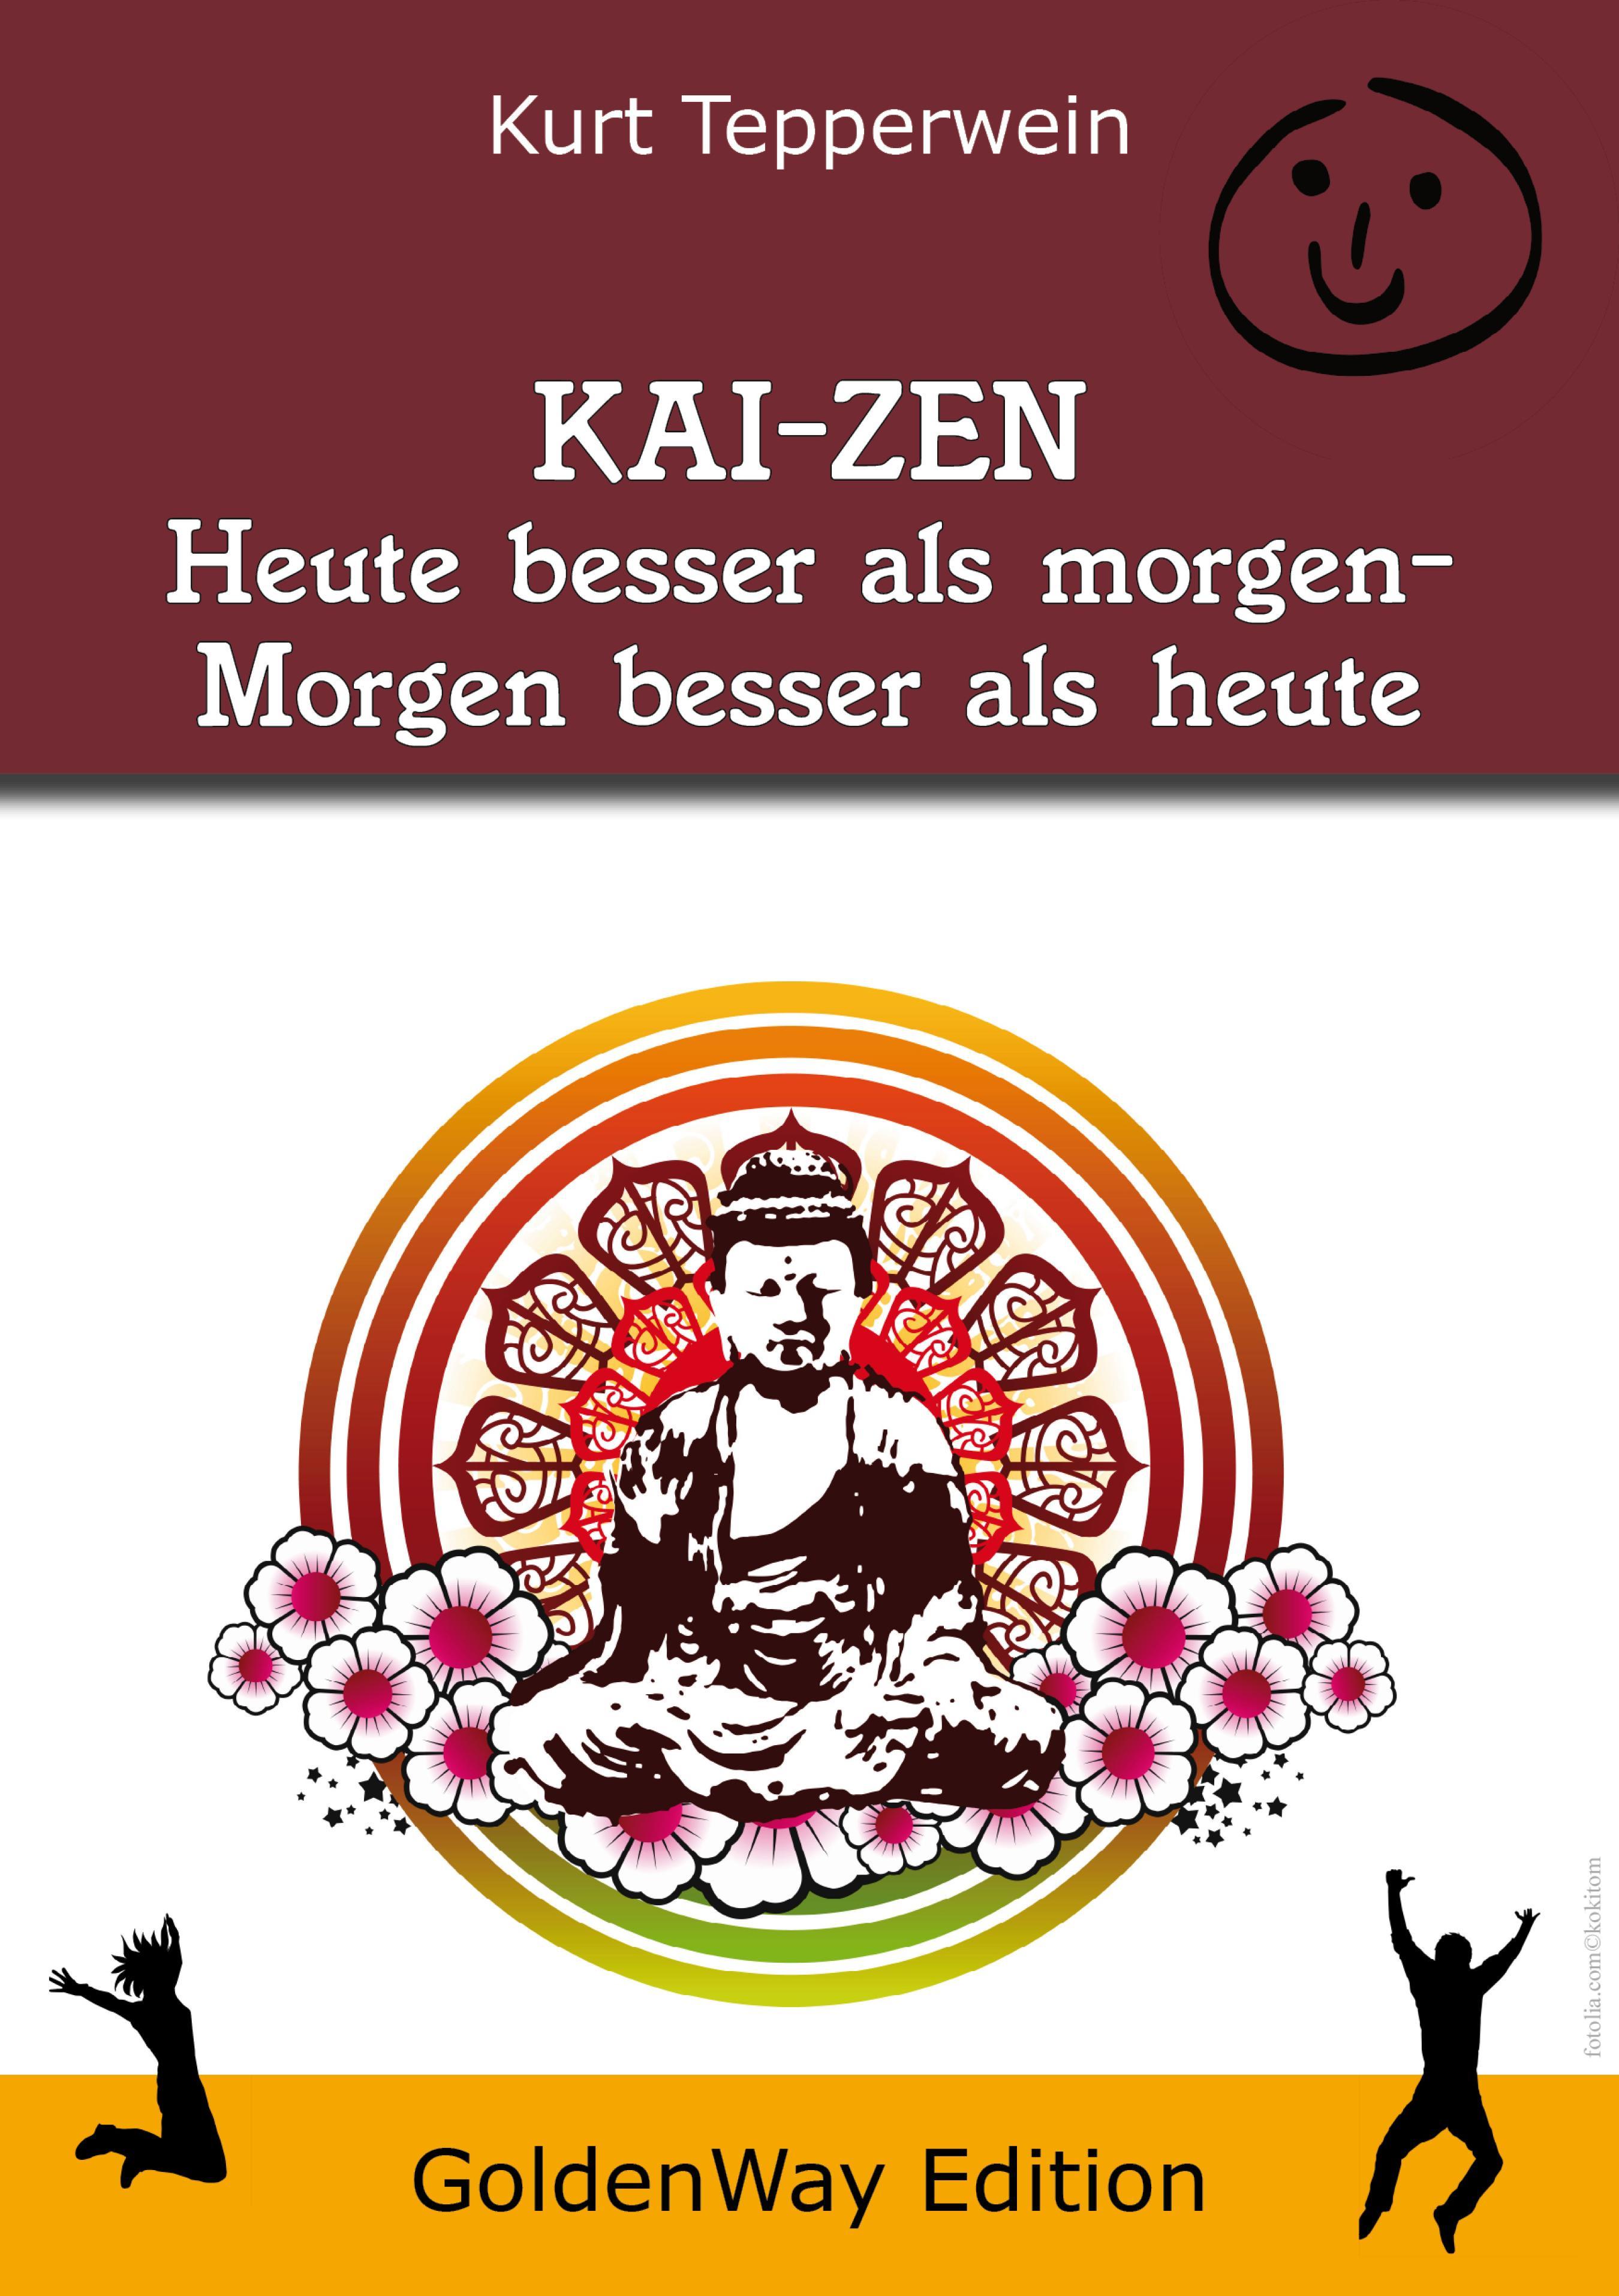 Kurt Tepperwein KAI-ZEN – Heute besser als gestern, morgen besser als heute als a certification package